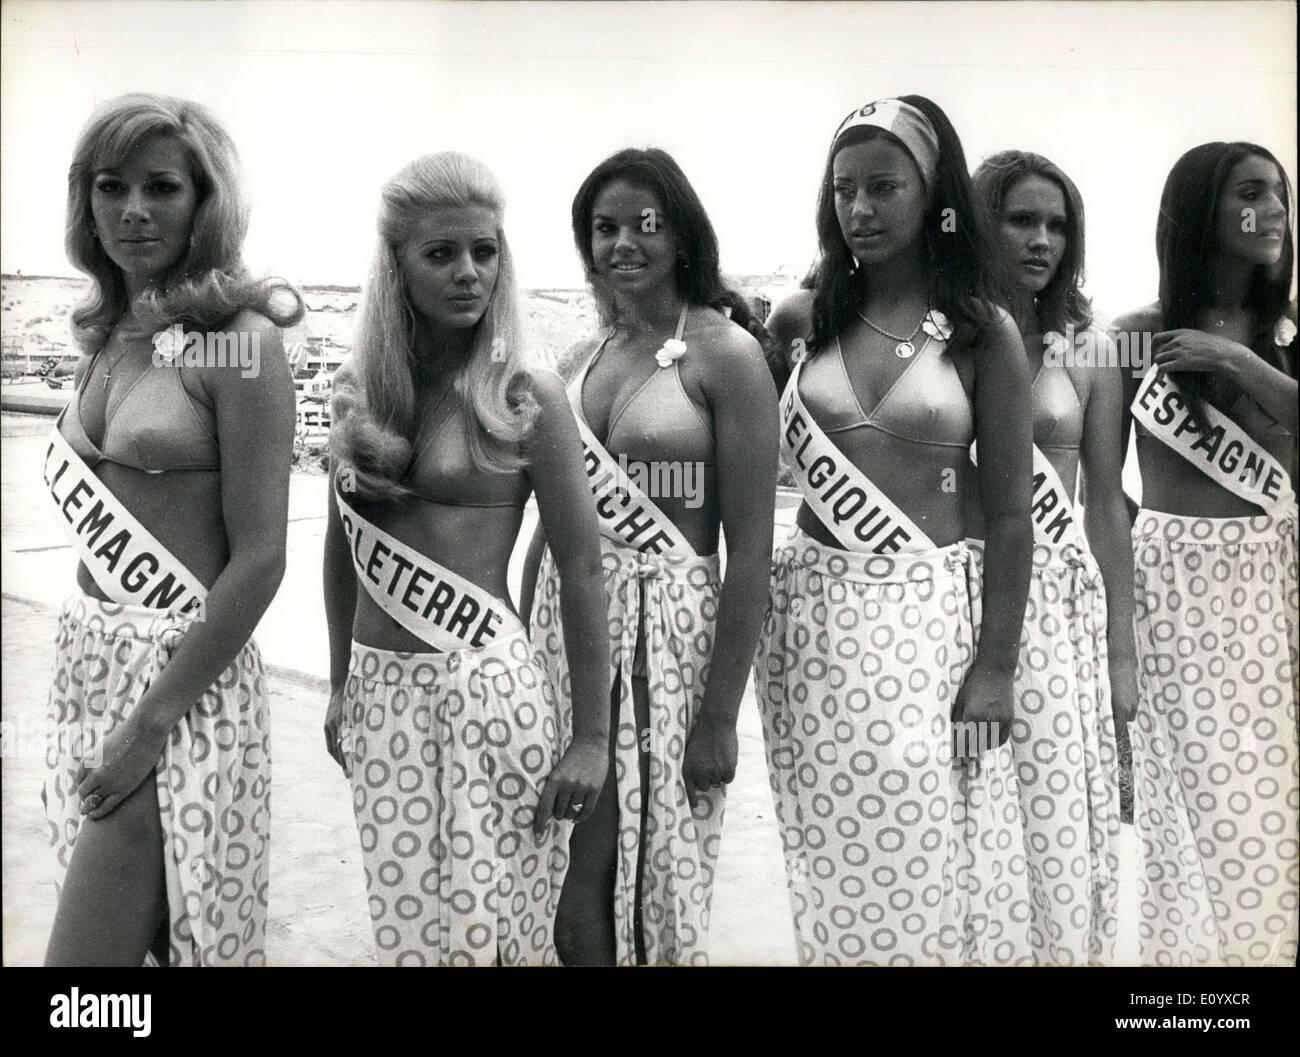 Sep. 15, 1971 - Lillian Atterer Germany, Pamela Wood England, Ursula Illich Austria, Martine de Hert Belgium, DorritStock Photo